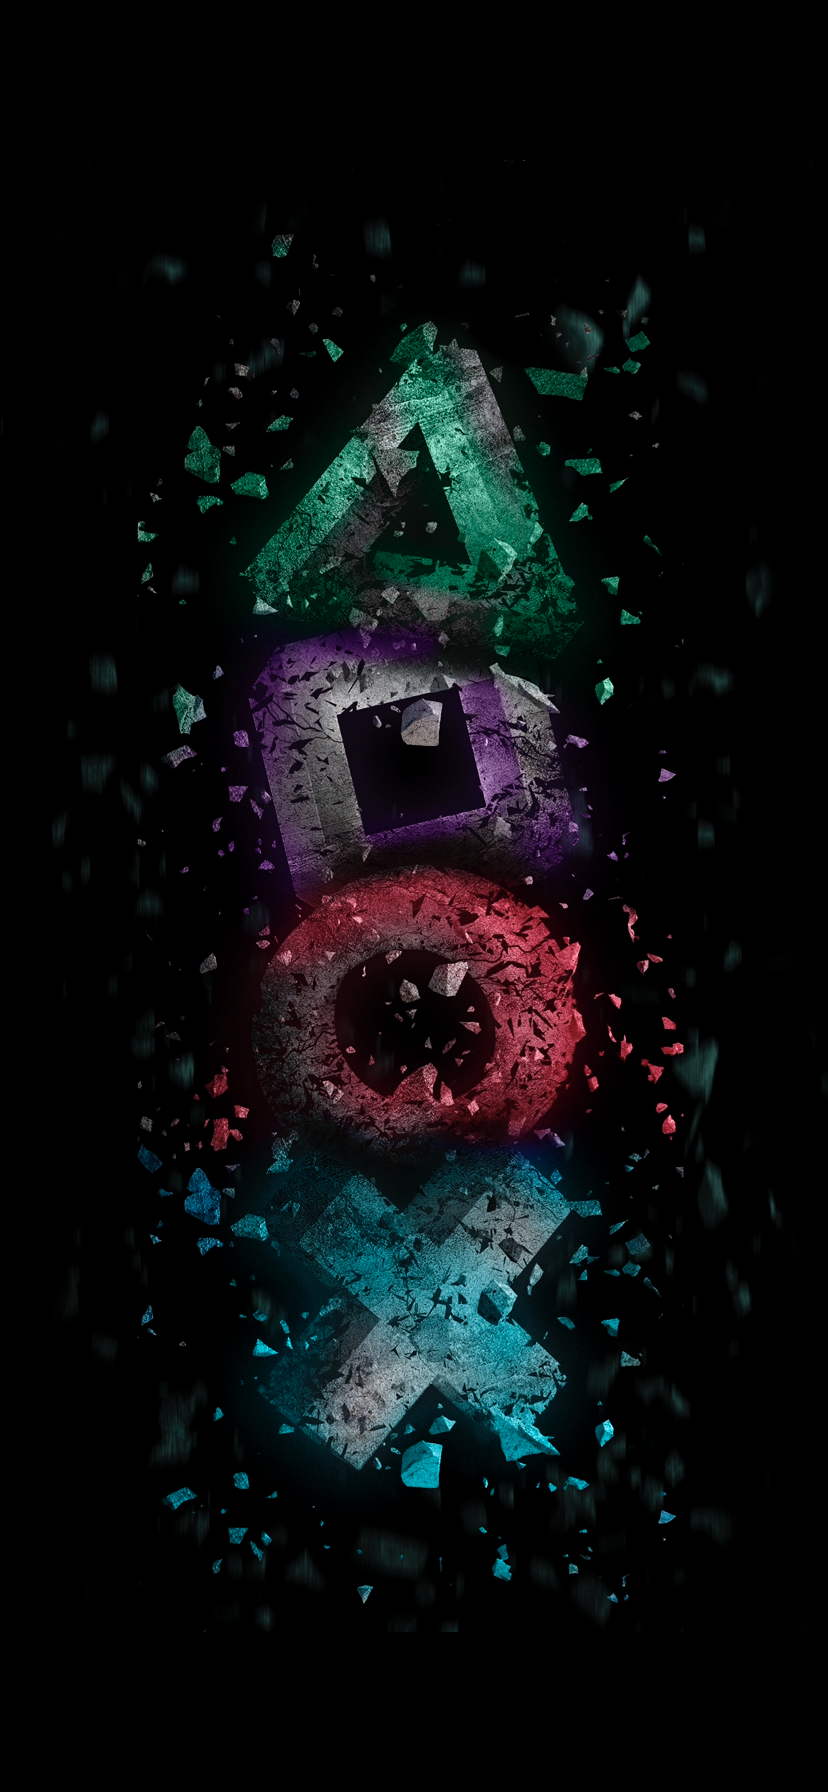 「iPhone wallpaper」おしゃれまとめの人気アイデア|Pinterest|Sarah【2020